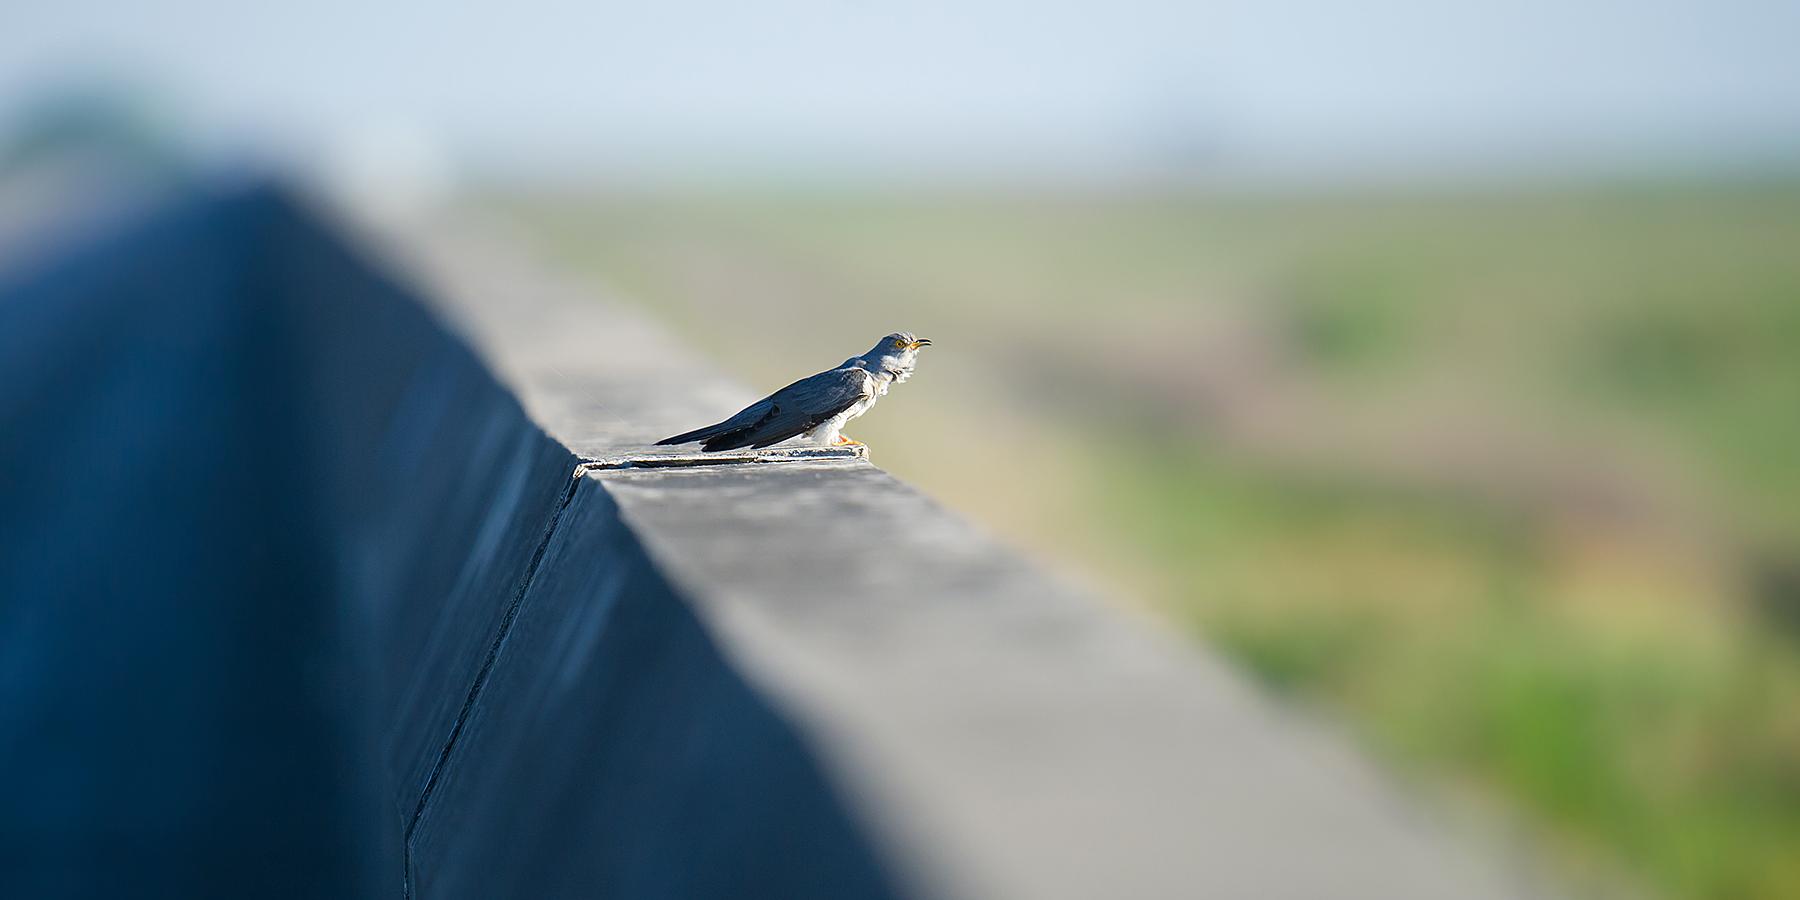 Common Cuckoo